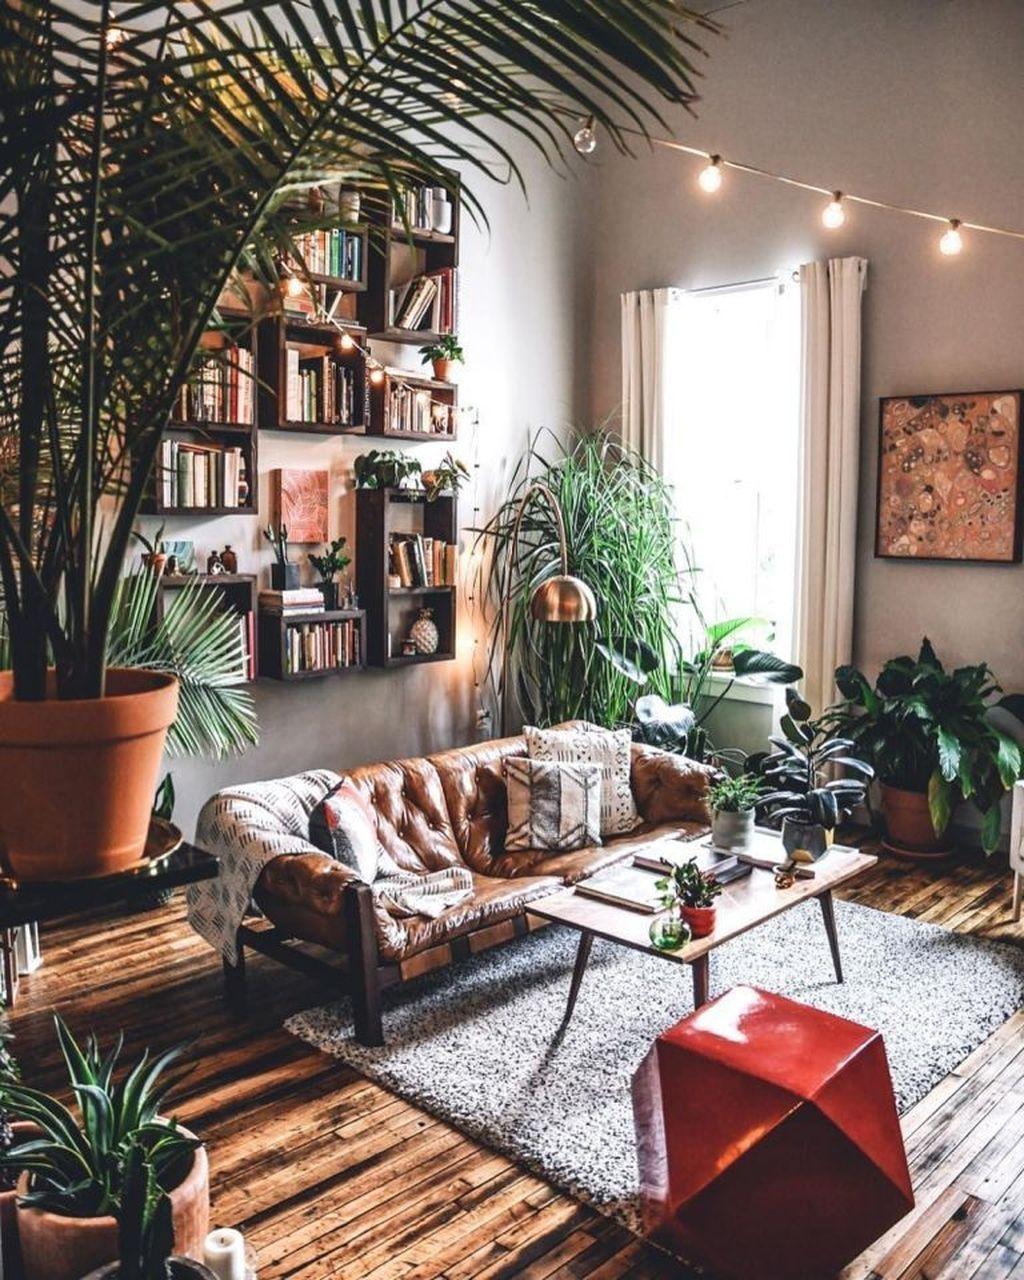 41 Modern Interior Design Ideas Decoracion De Interiores